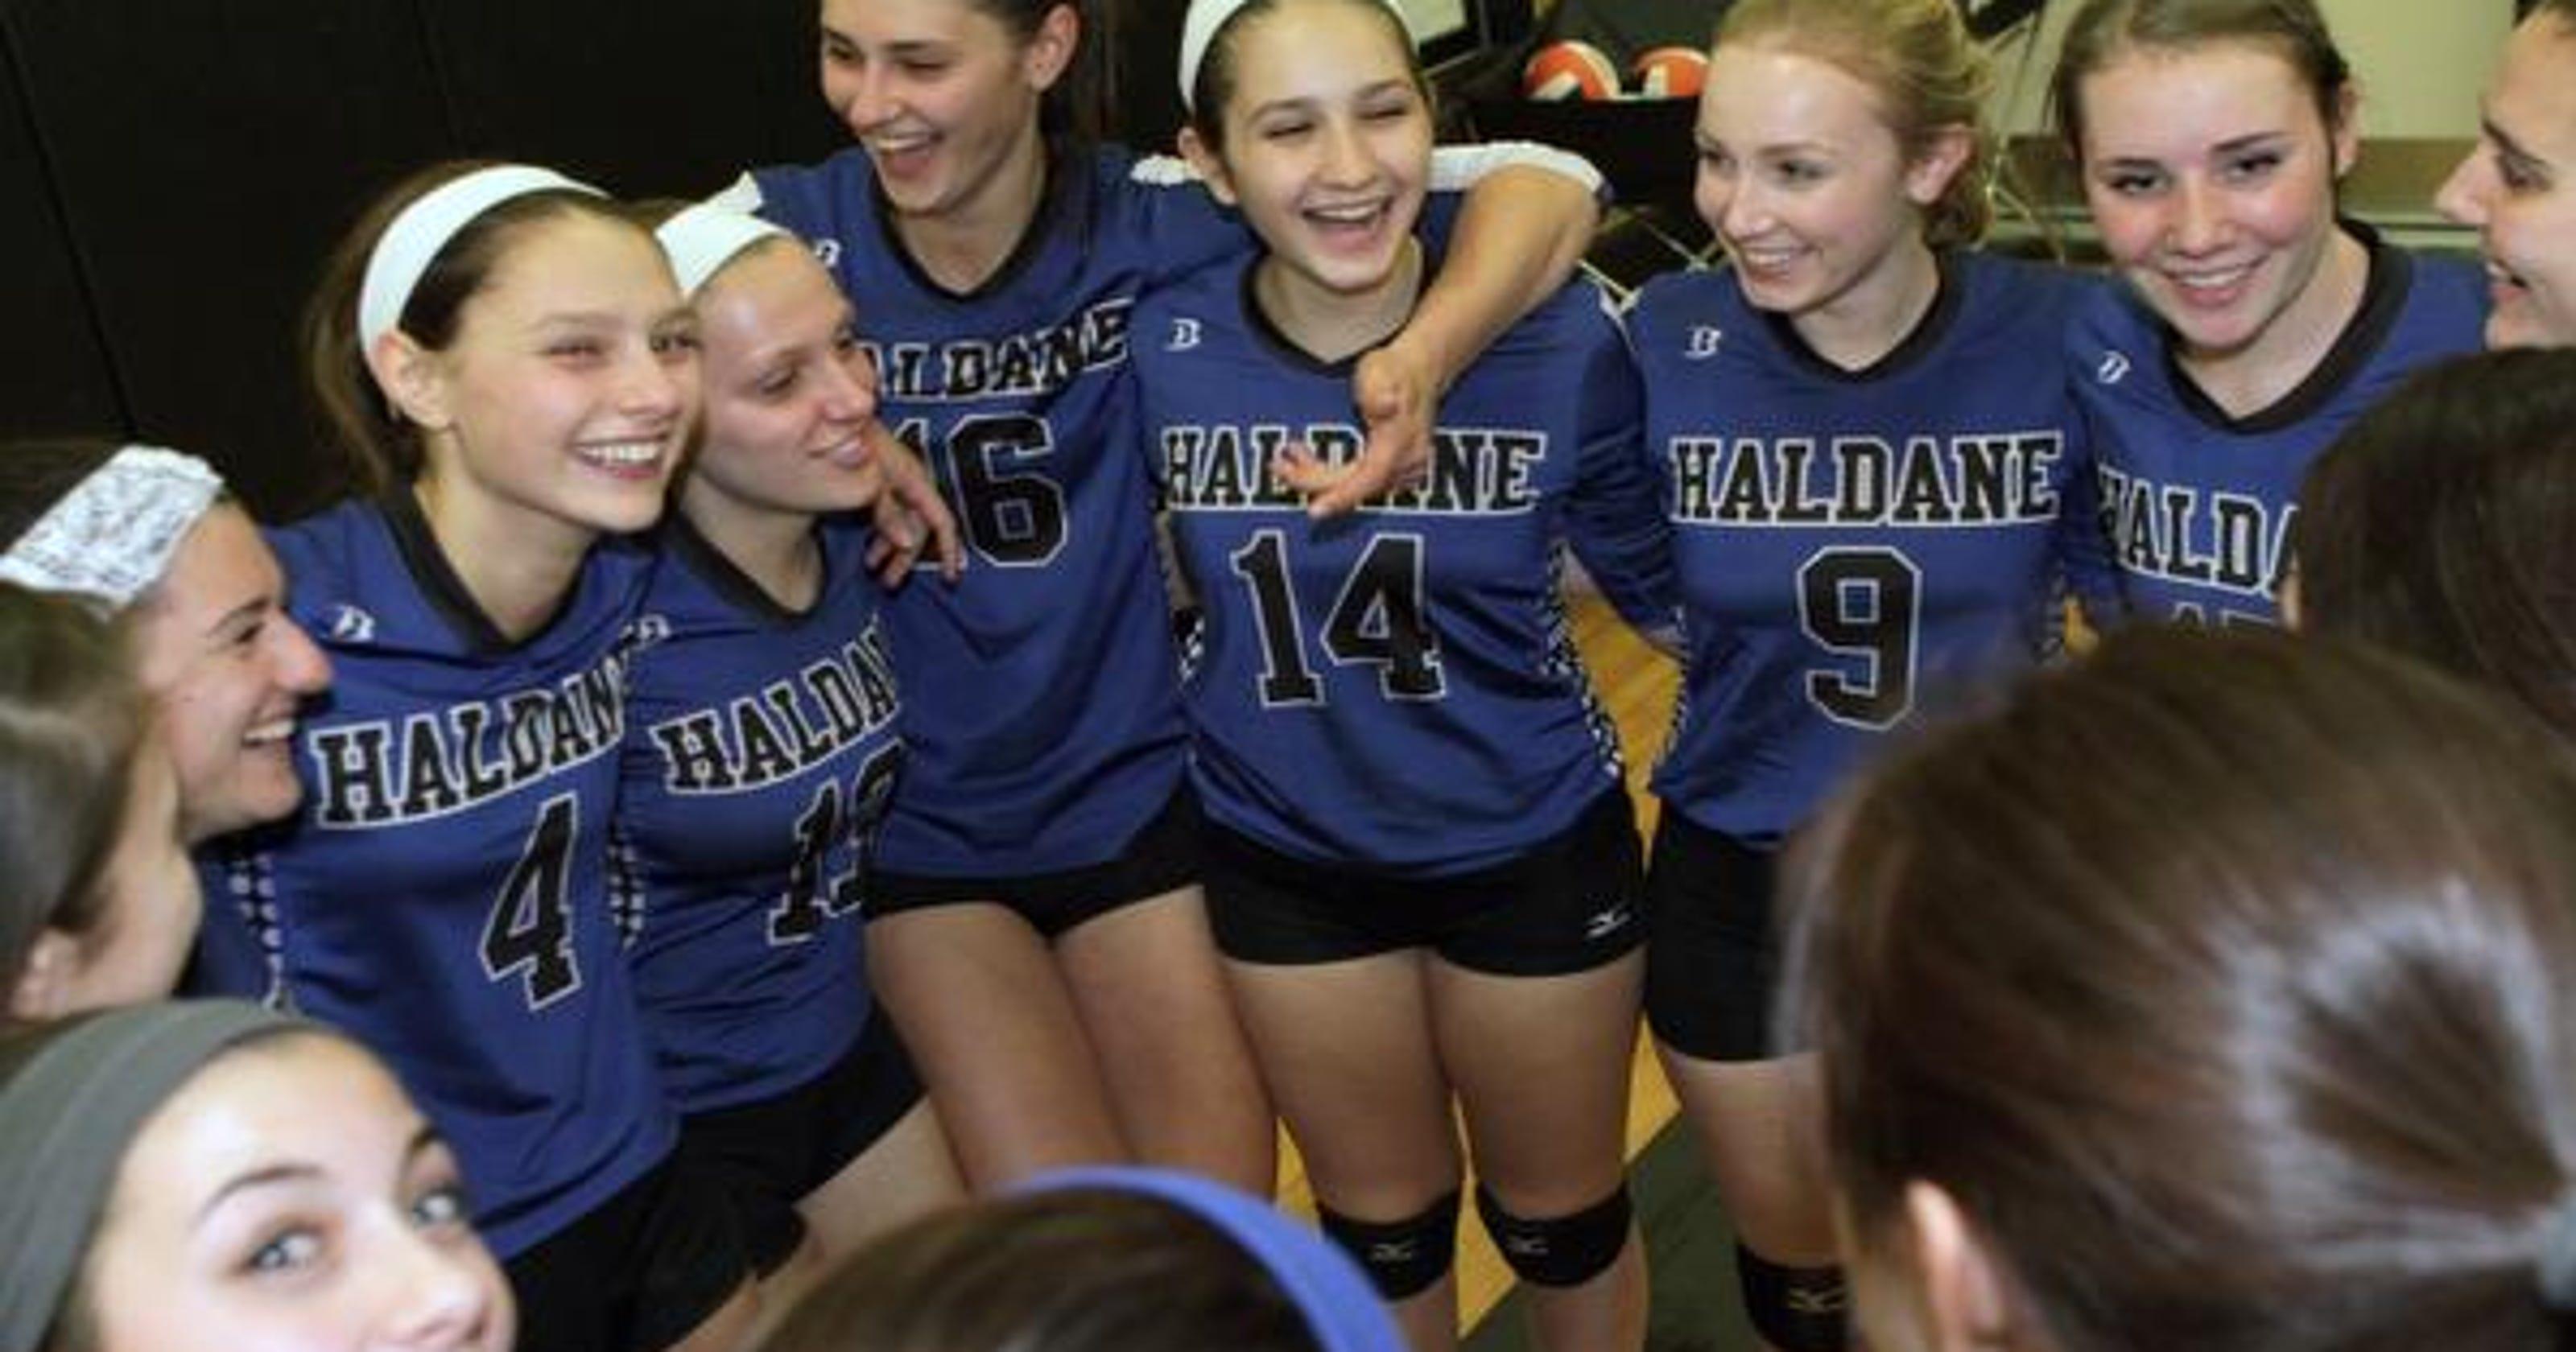 Volleyball Haldane Swiftly Sweeps Seward Advances To Regional